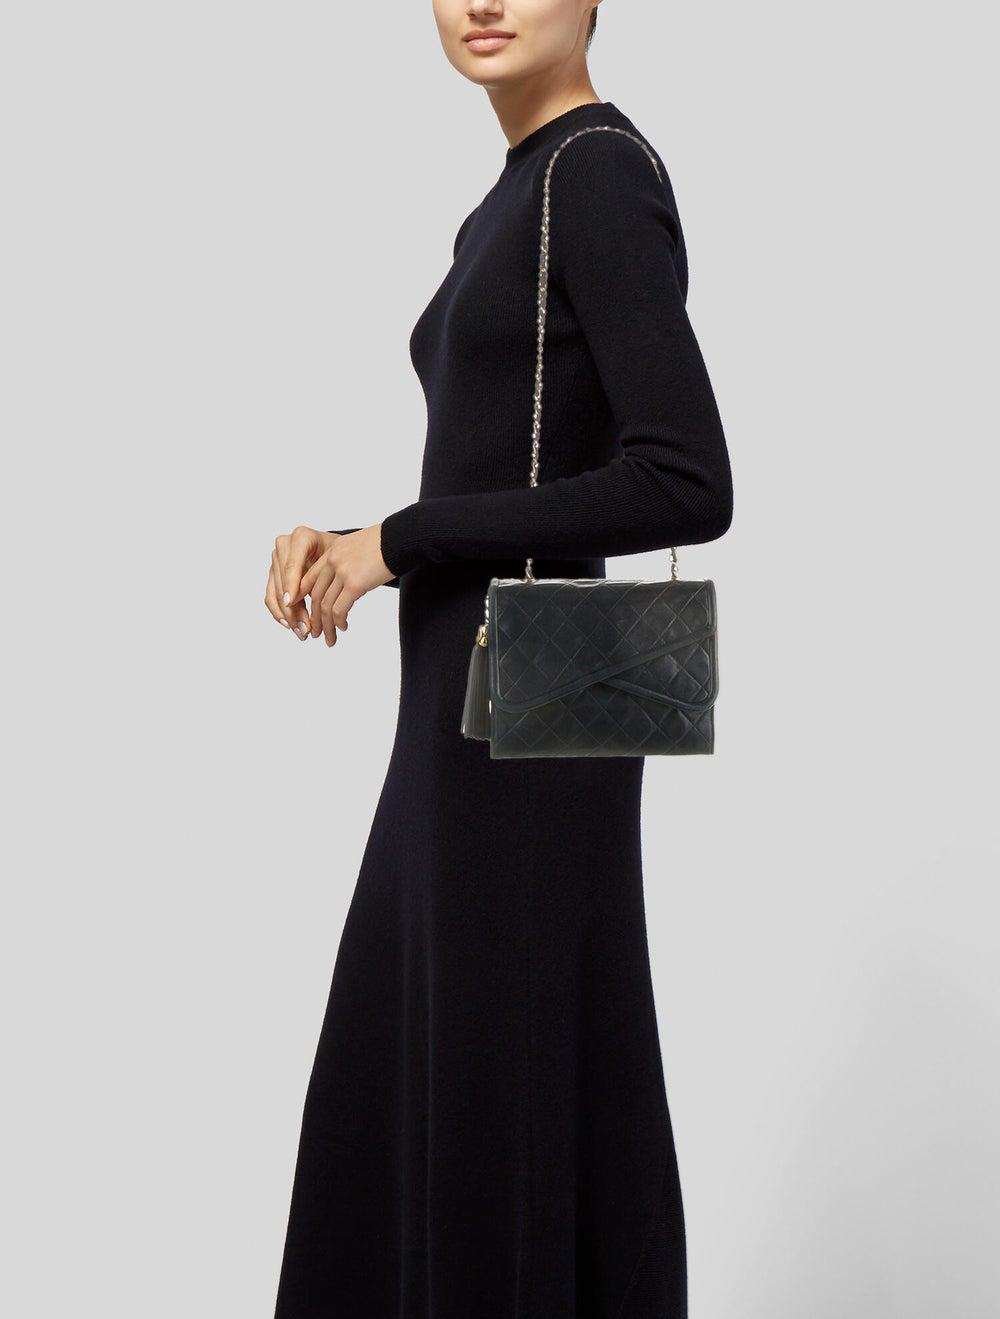 Chanel Vintage Mini Quilted Flap Bag Blue - image 2